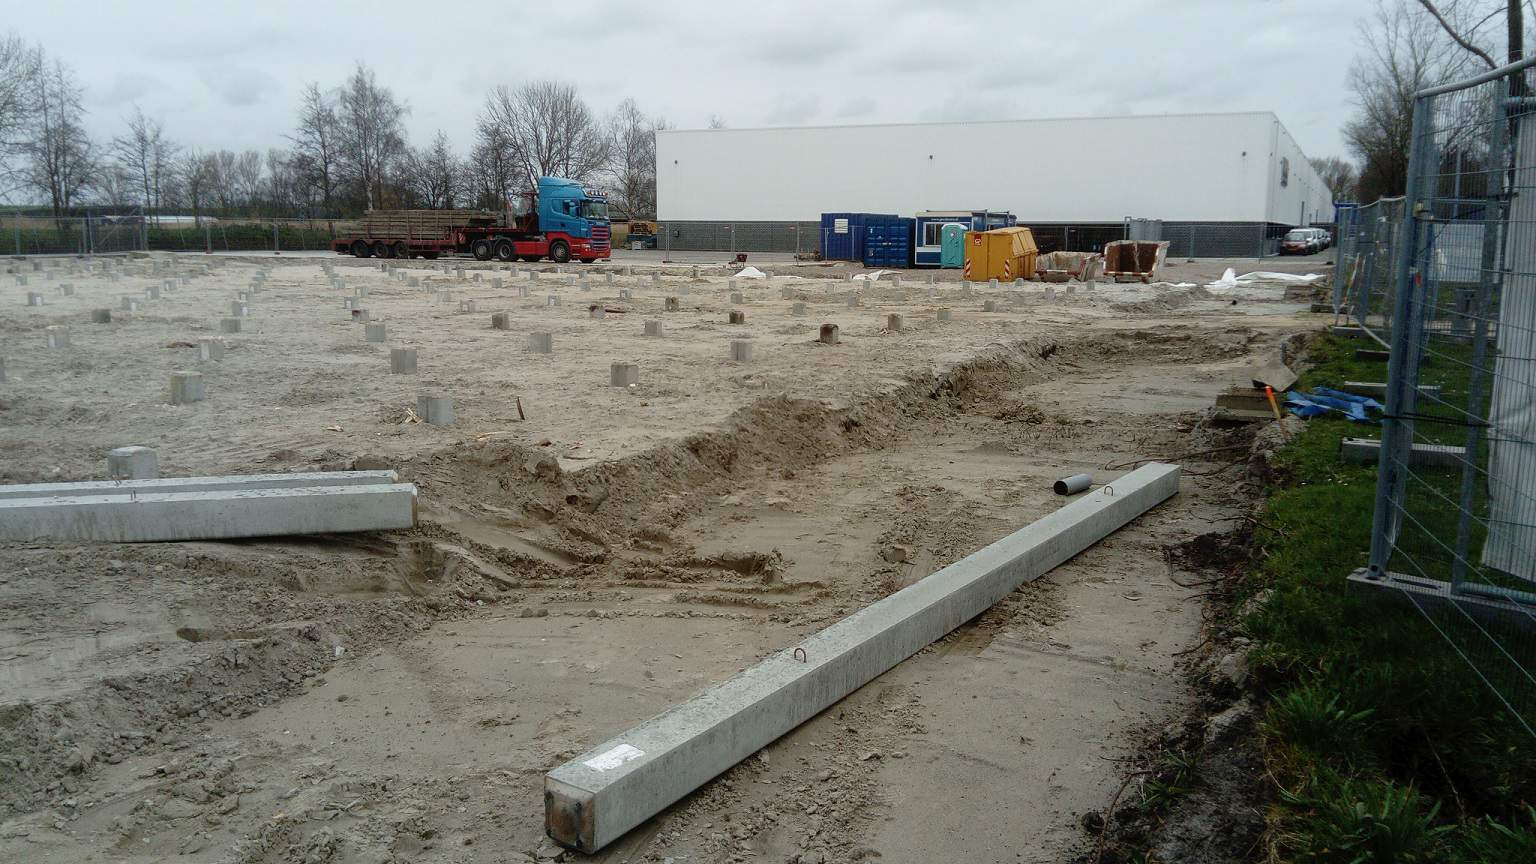 nieuwbouw grondwerk terreinverharding hörmann alkmaar 1